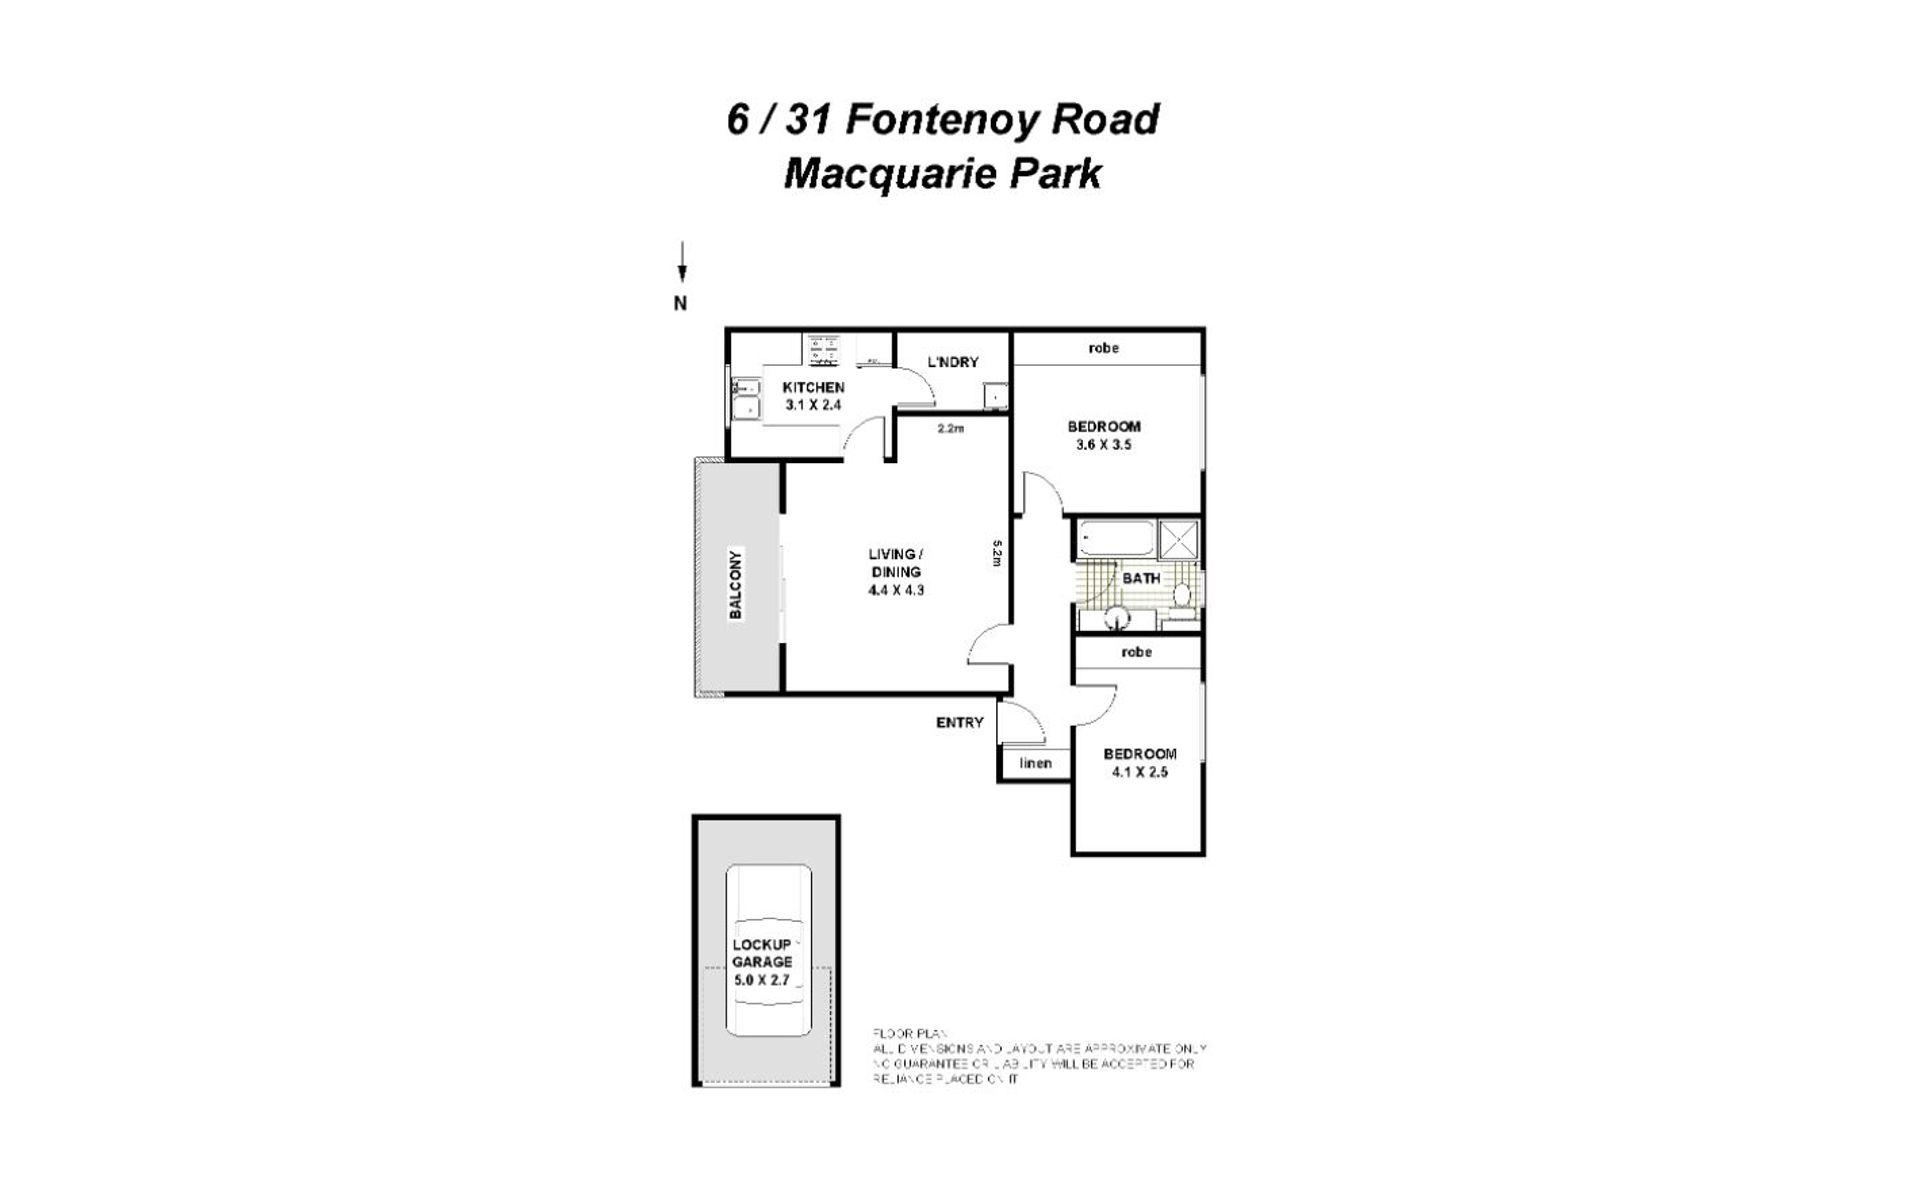 6/31 Fontenoy Road, Macquarie Park, NSW 2113